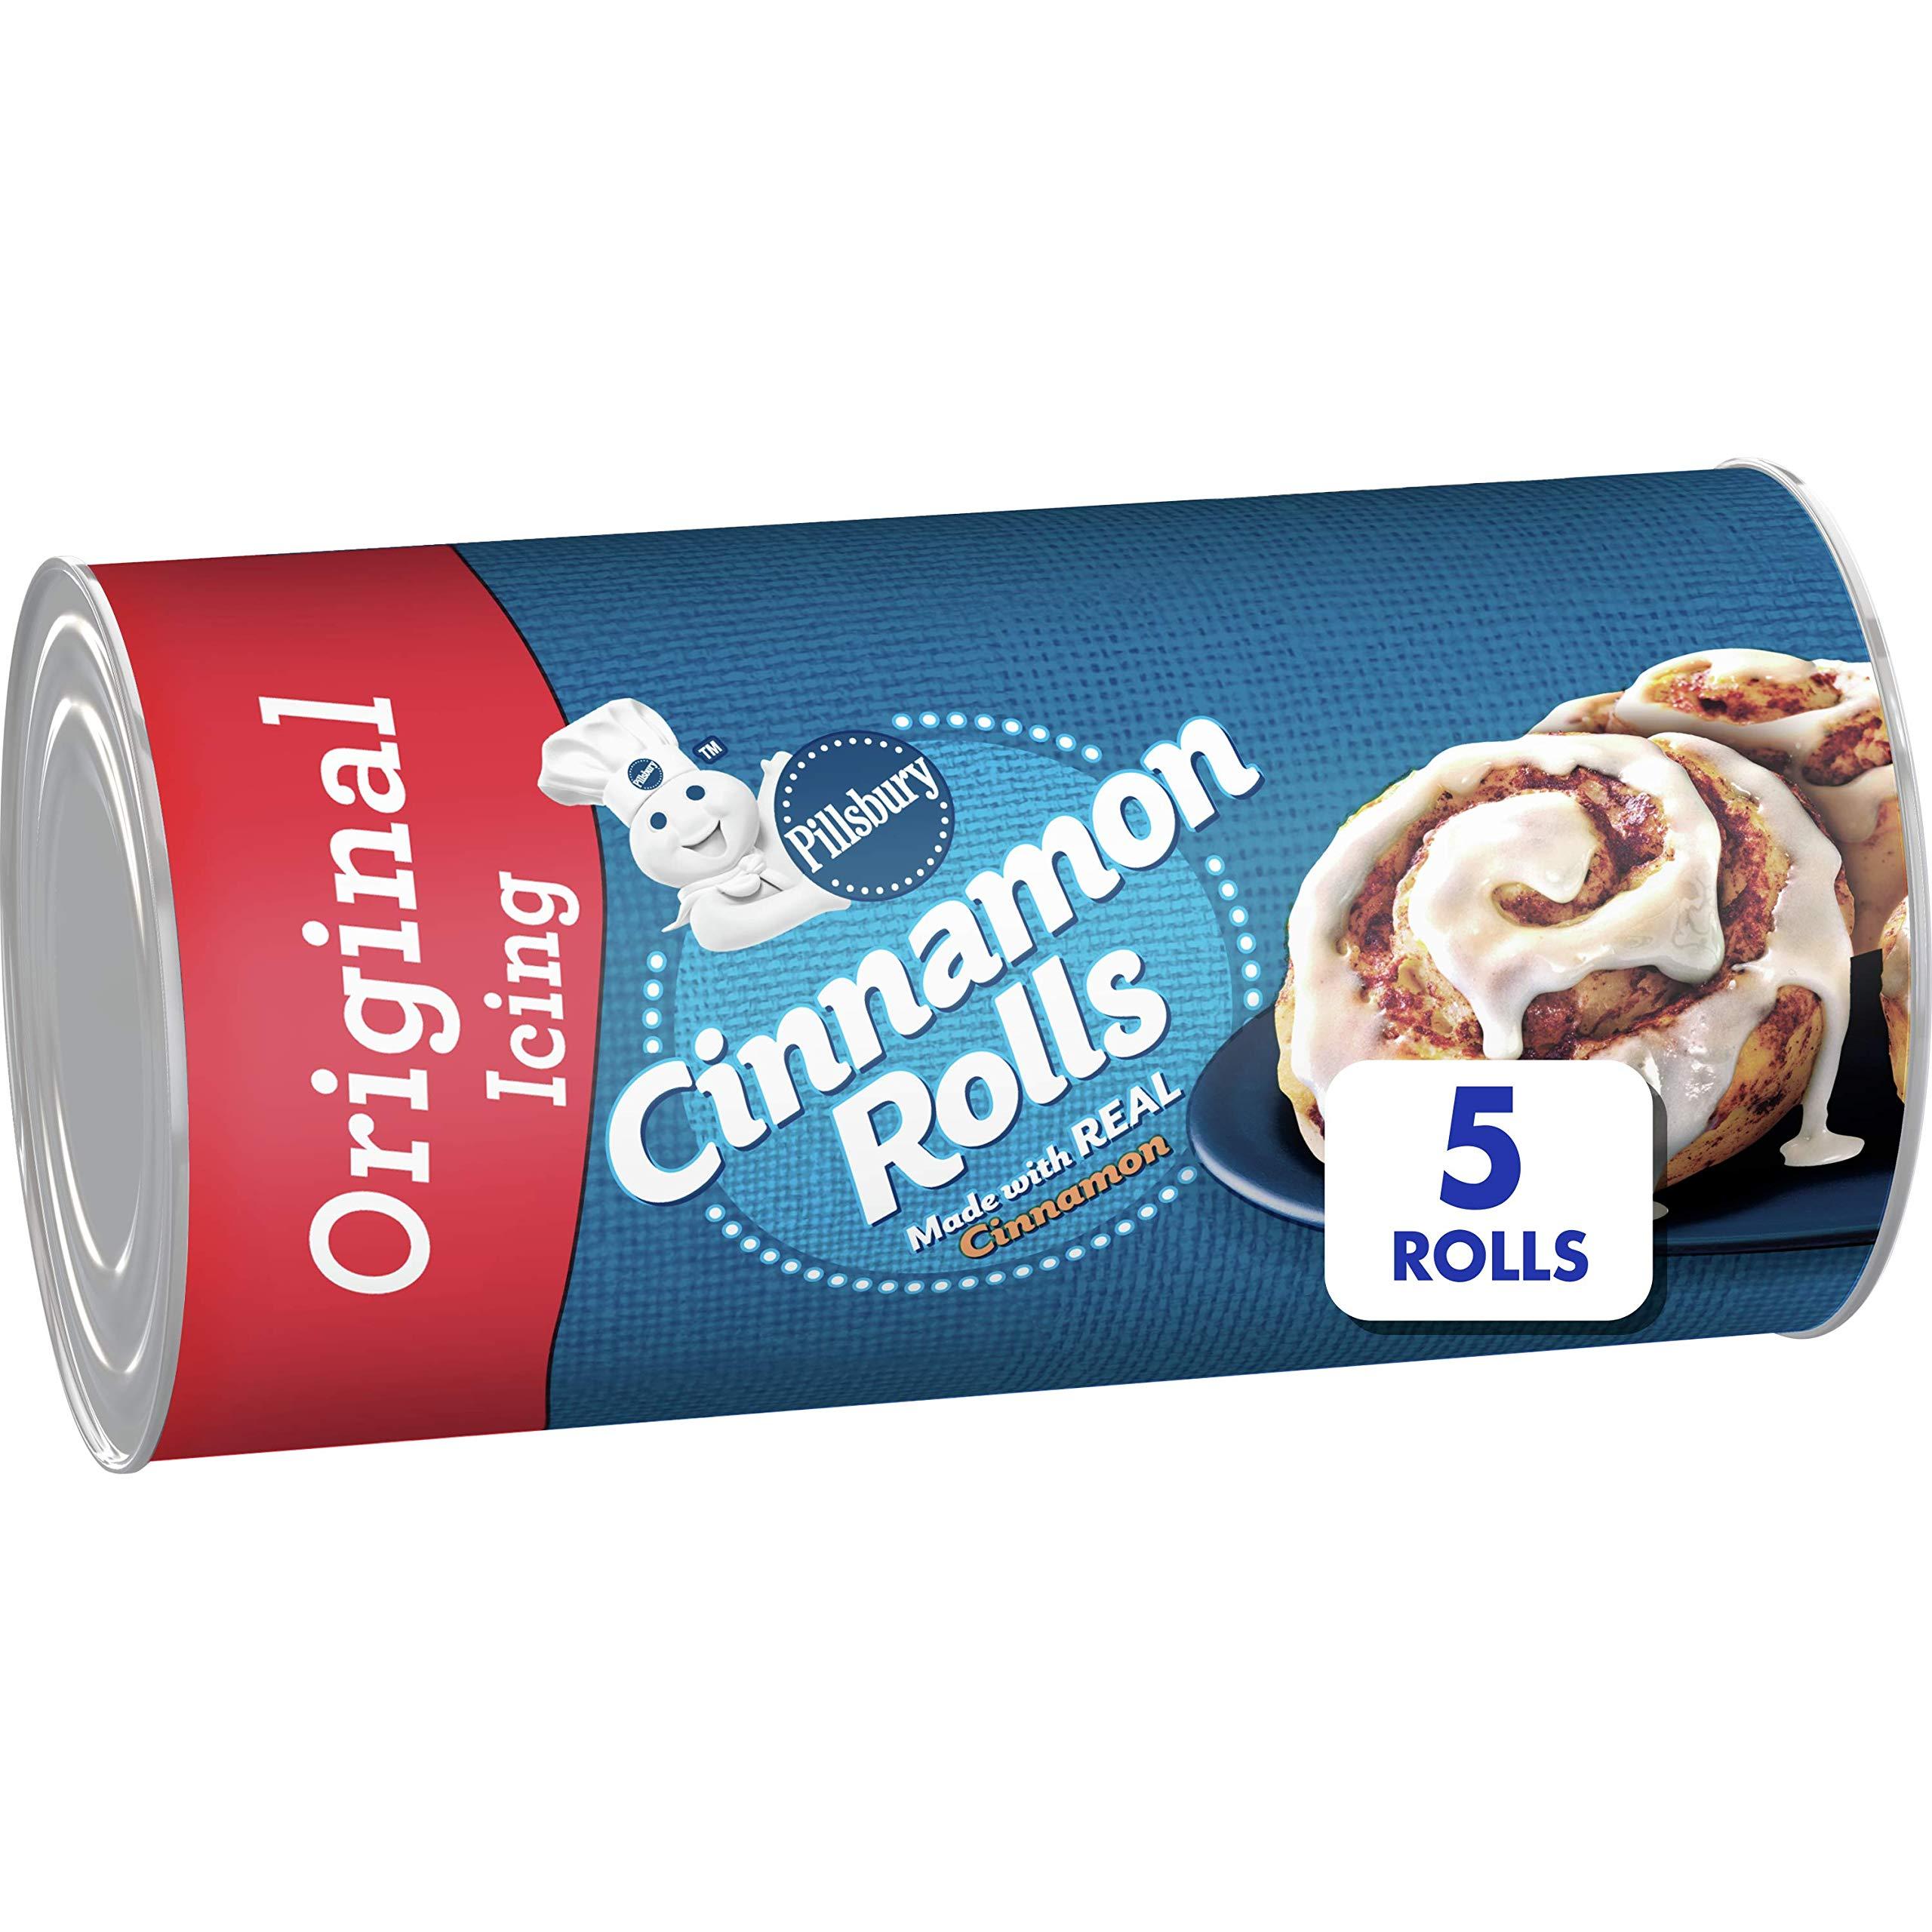 Pillsbury Cinnamon Rolls With Icing, 5 ct, 7.3 oz